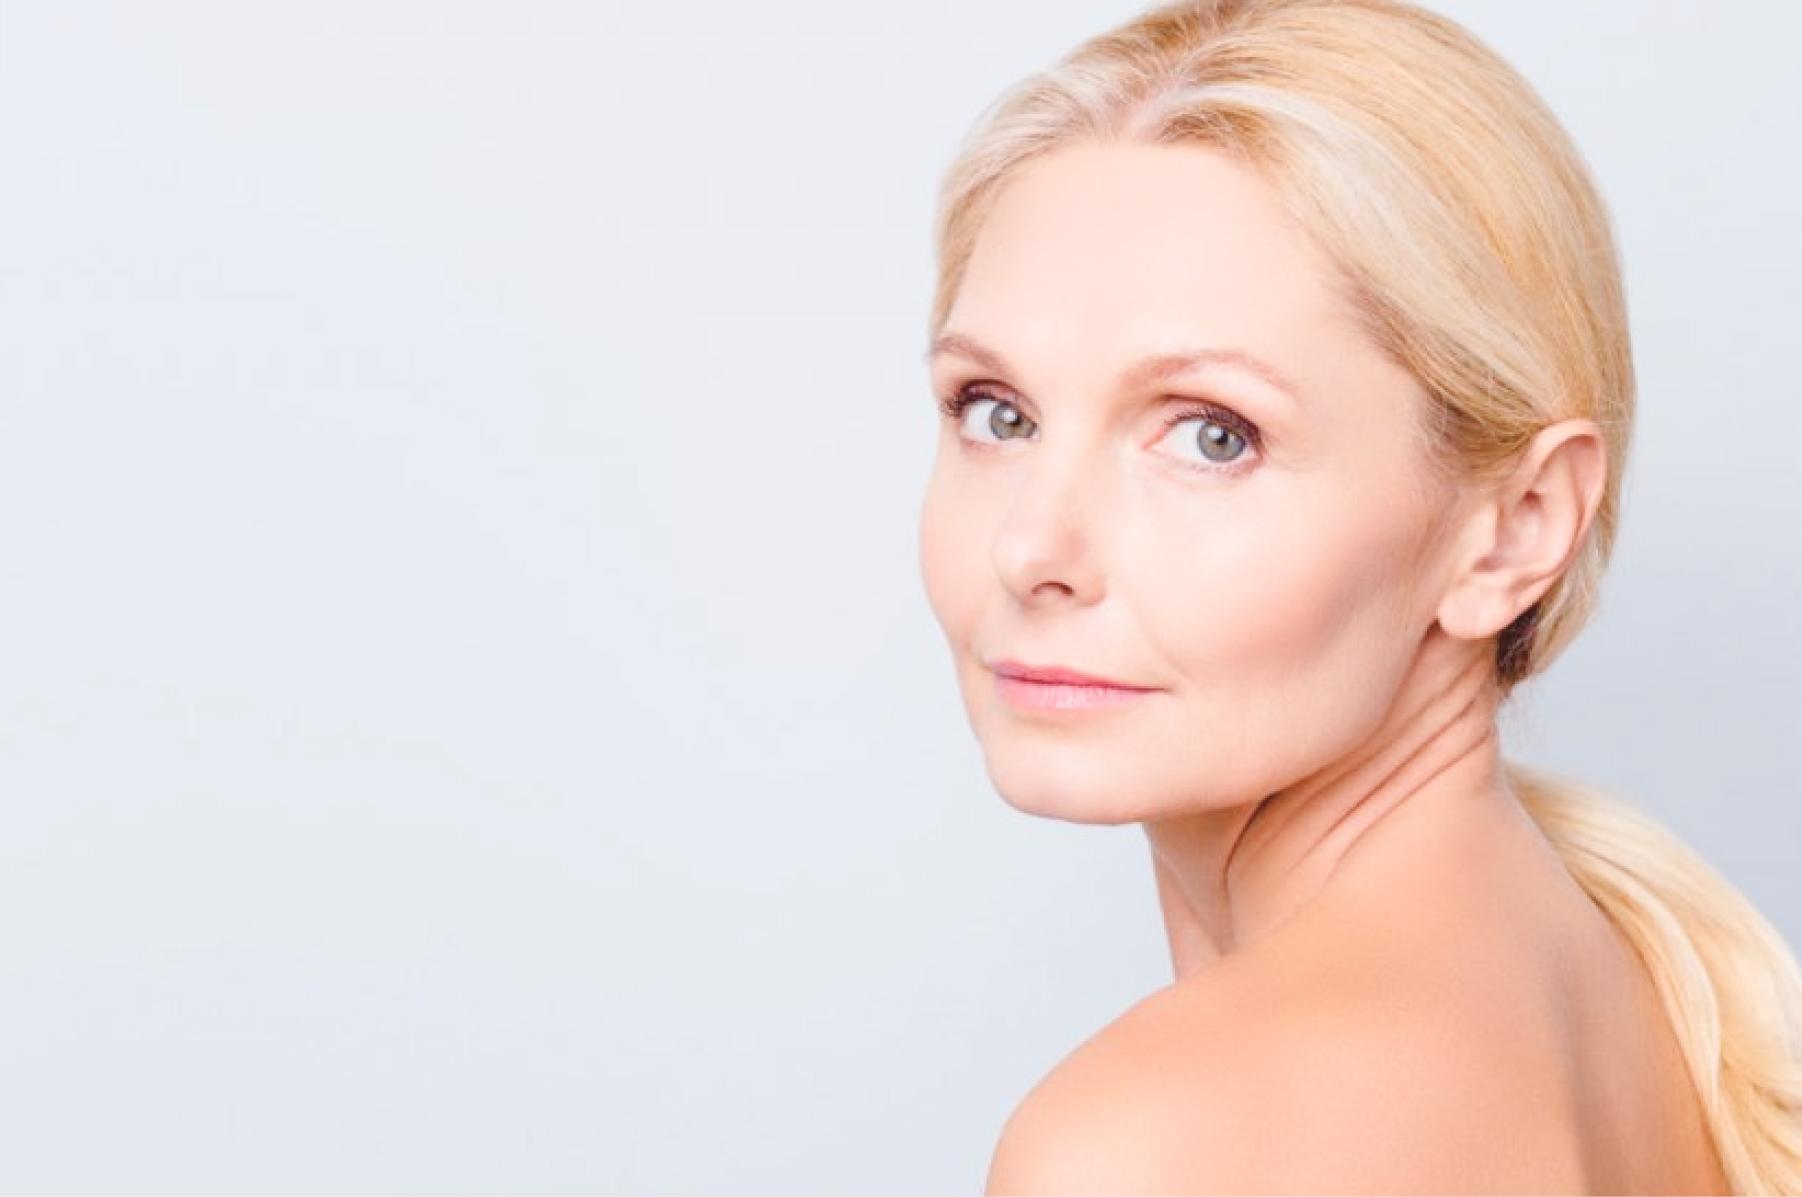 skin treatments in the UK